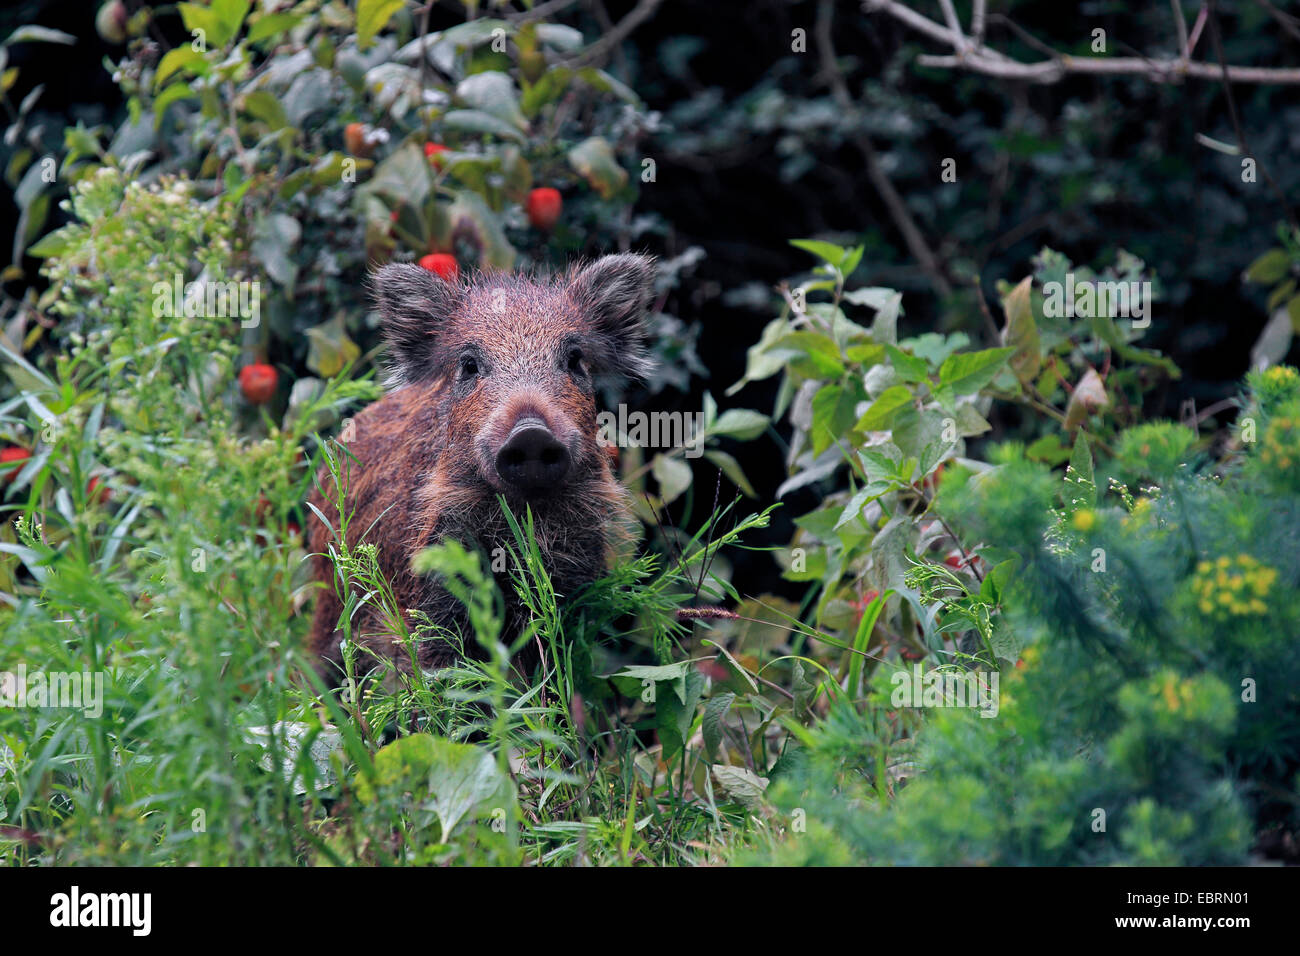 wild boar, pig, wild boar (Sus scrofa), shote standing in the shrub, Germany, Baden-Wuerttemberg - Stock Image